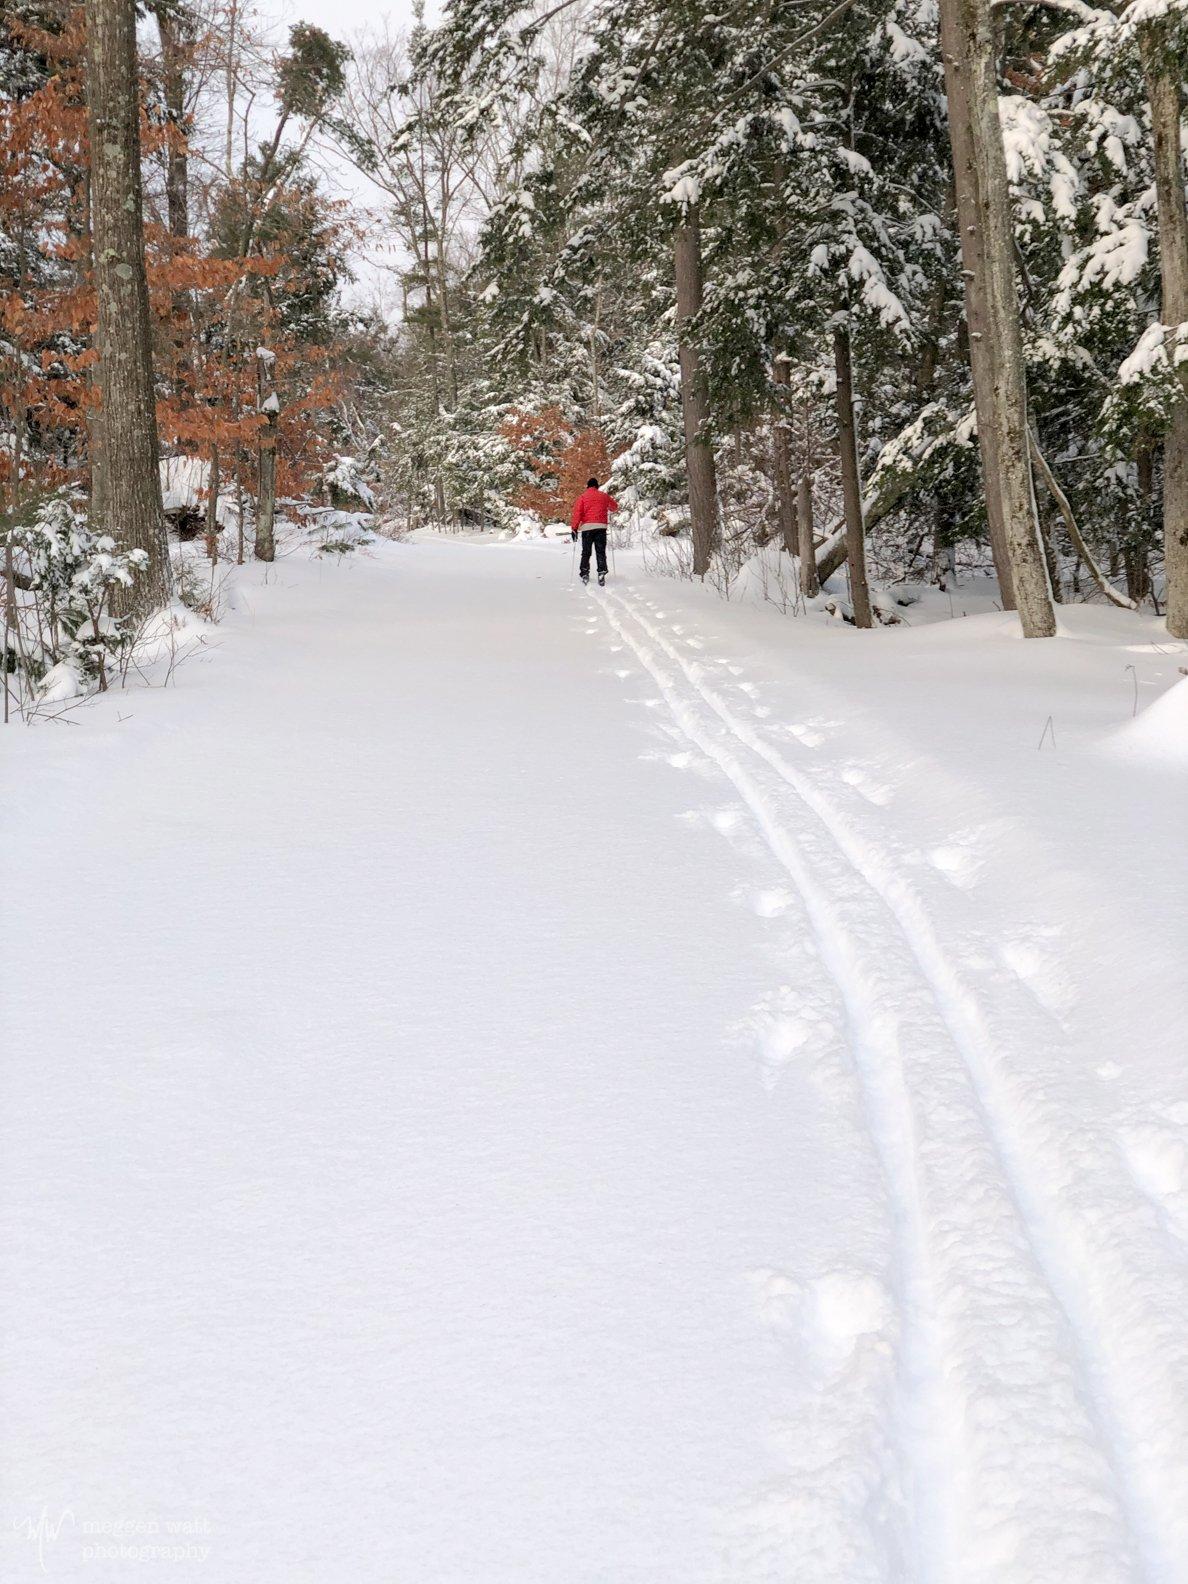 Heritage Trail Jan 19 2020-9441